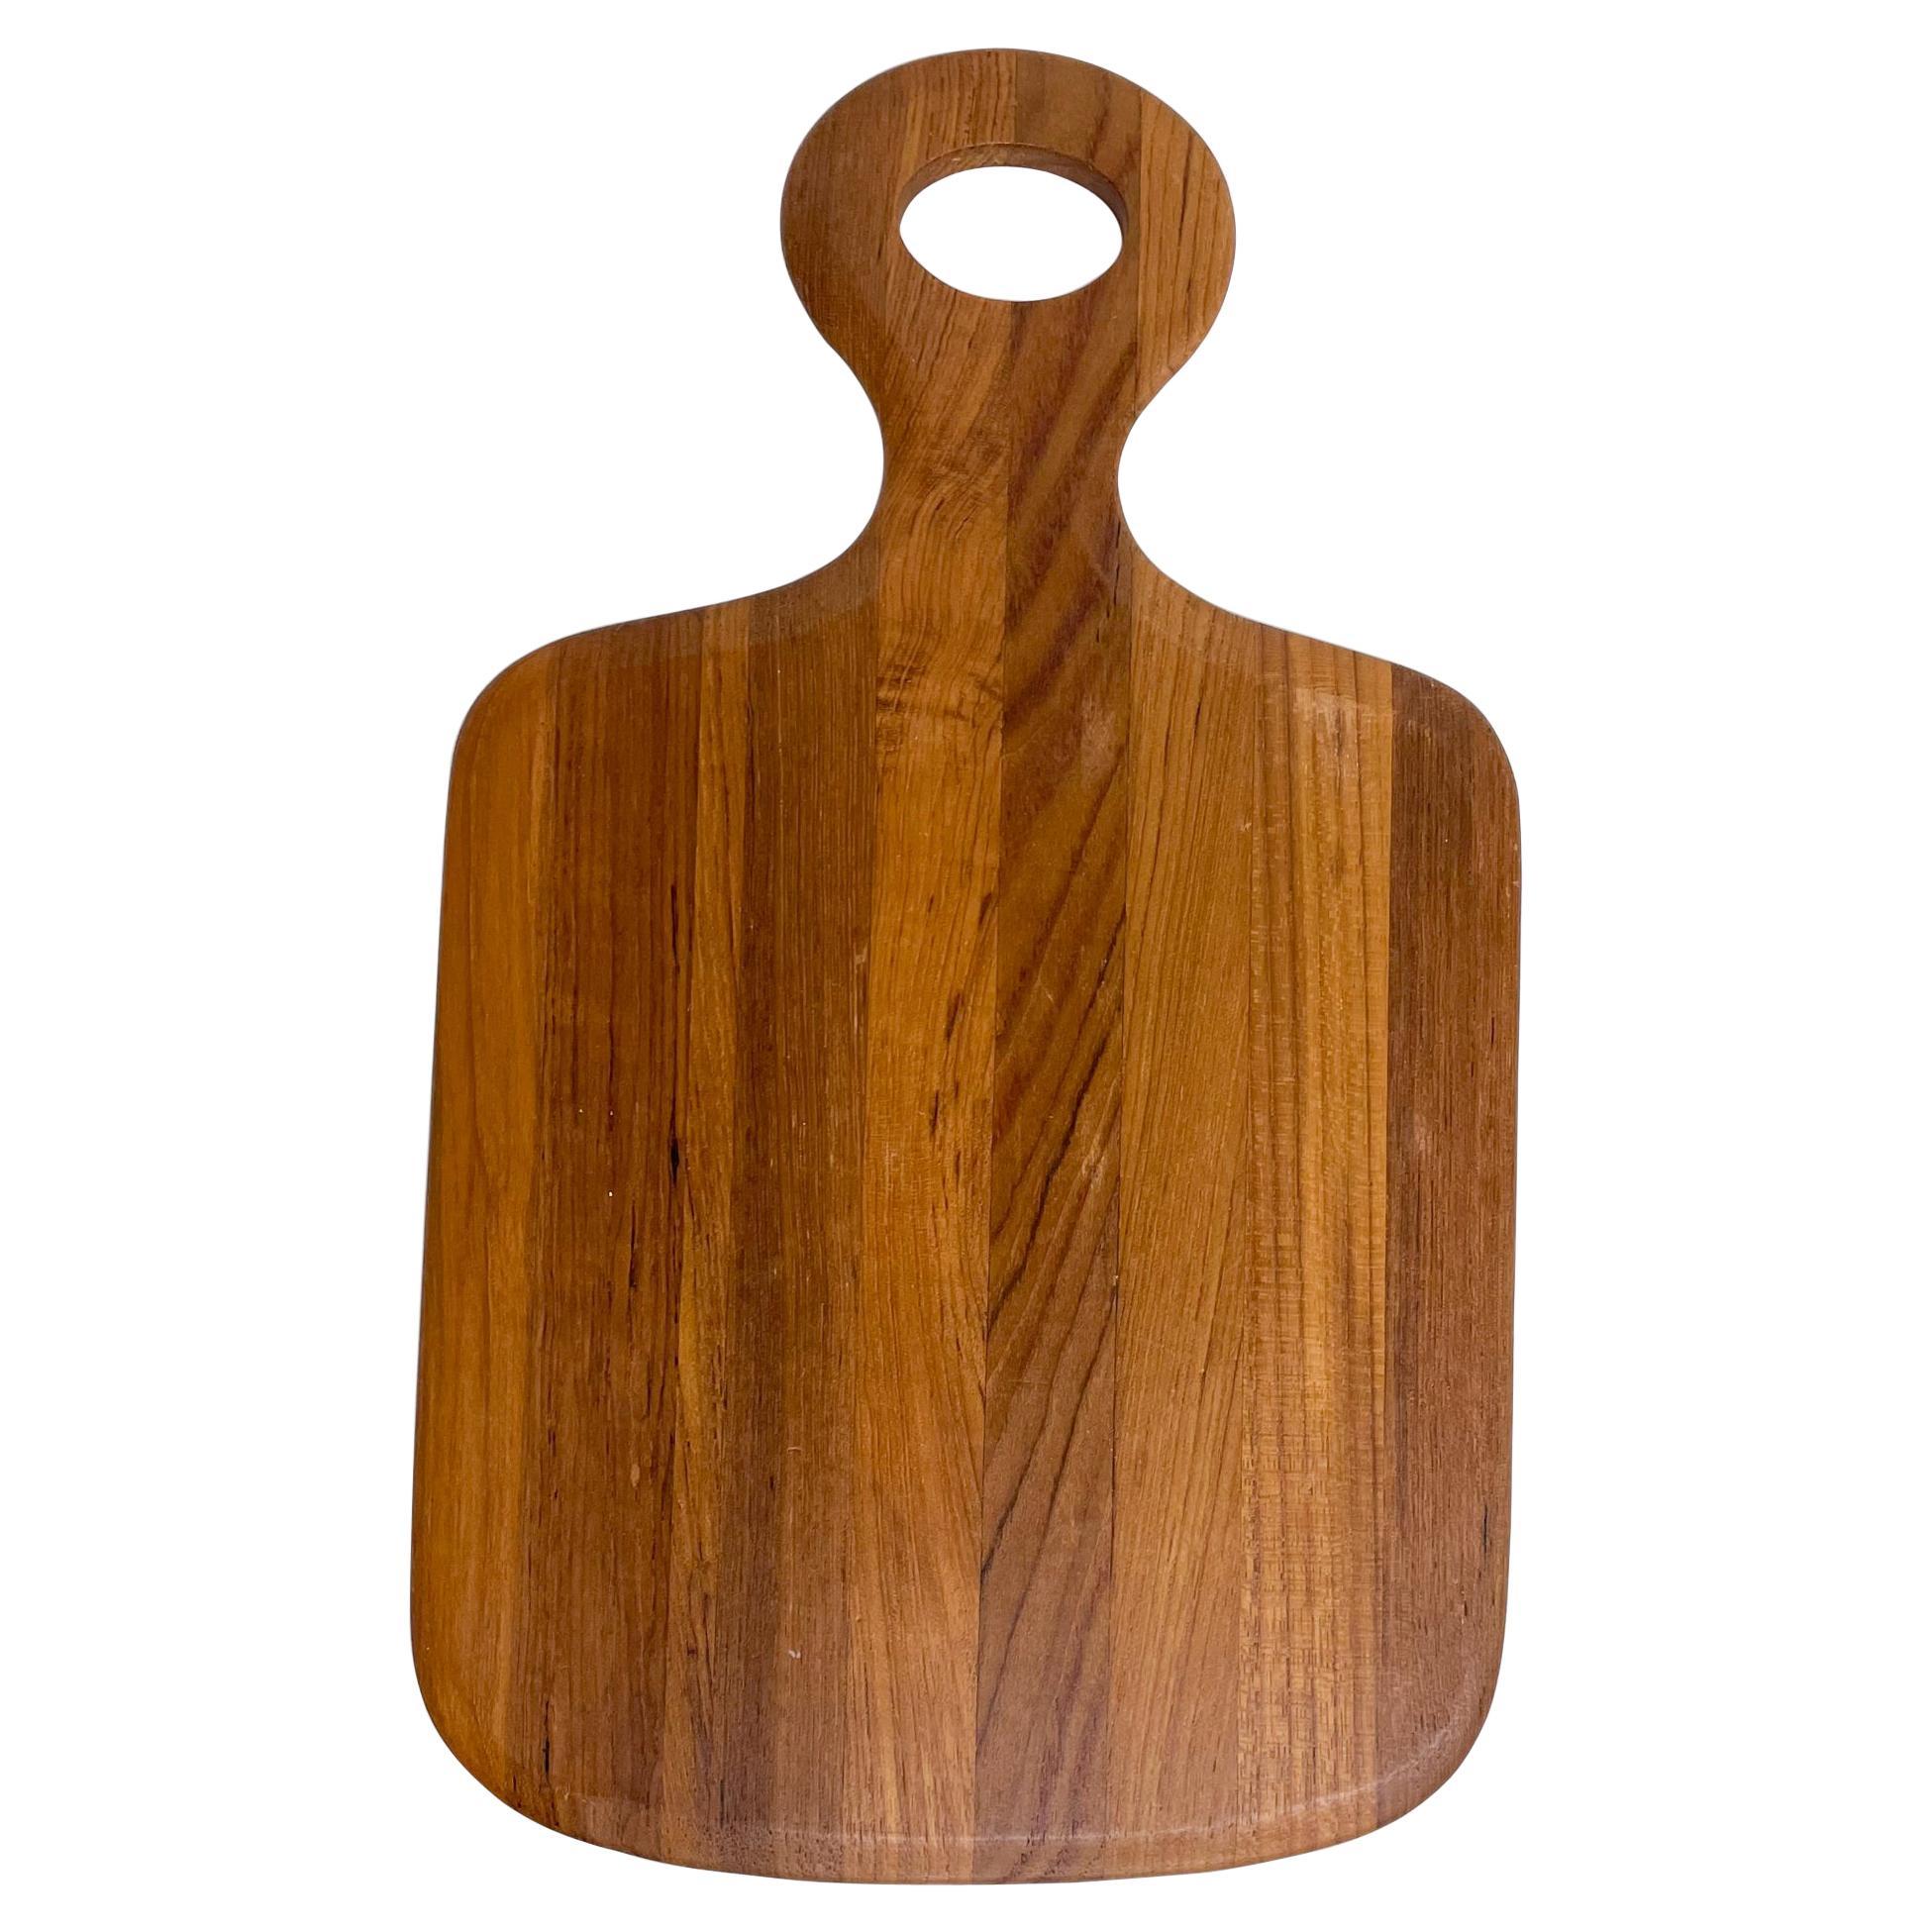 Scandinavian Modern Teak Wood Cheese Cutting Board Wood Platter Dansk 1970s